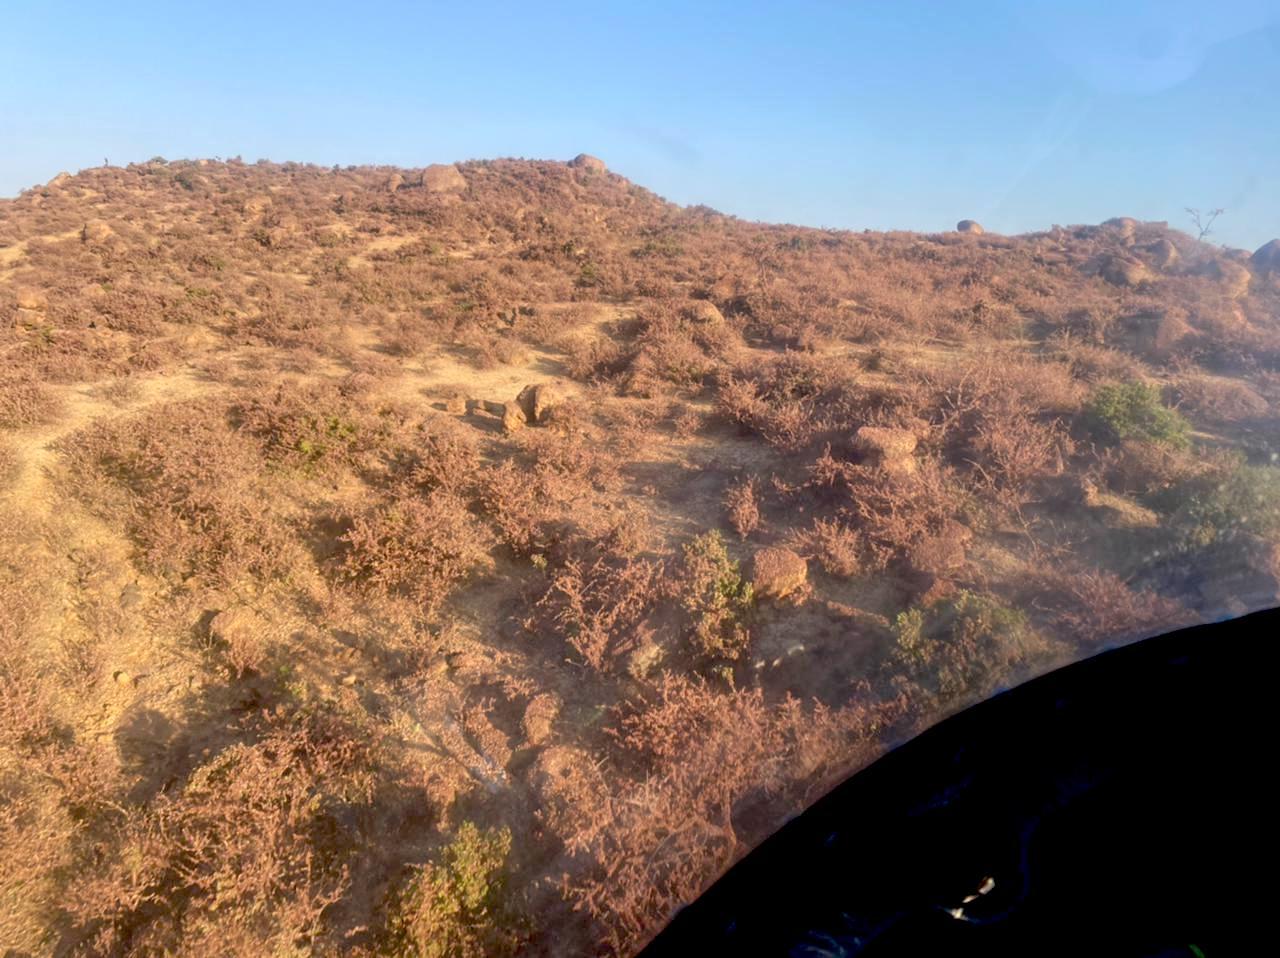 East Hararge, Ethiopia (16 Feb)